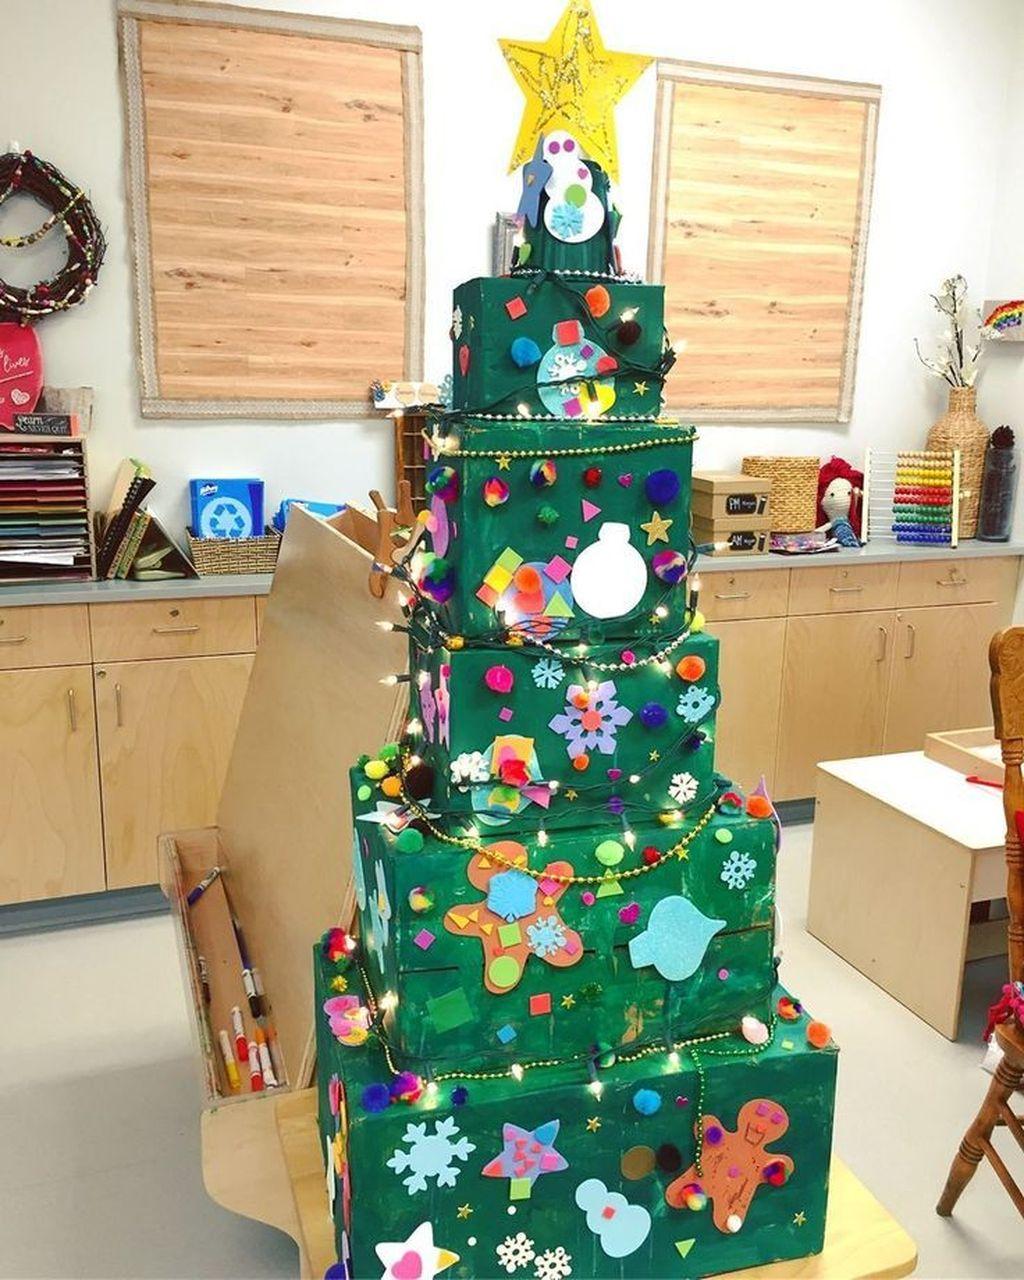 Amazing Winter Christmas Tree Design And Decor Ideas 28